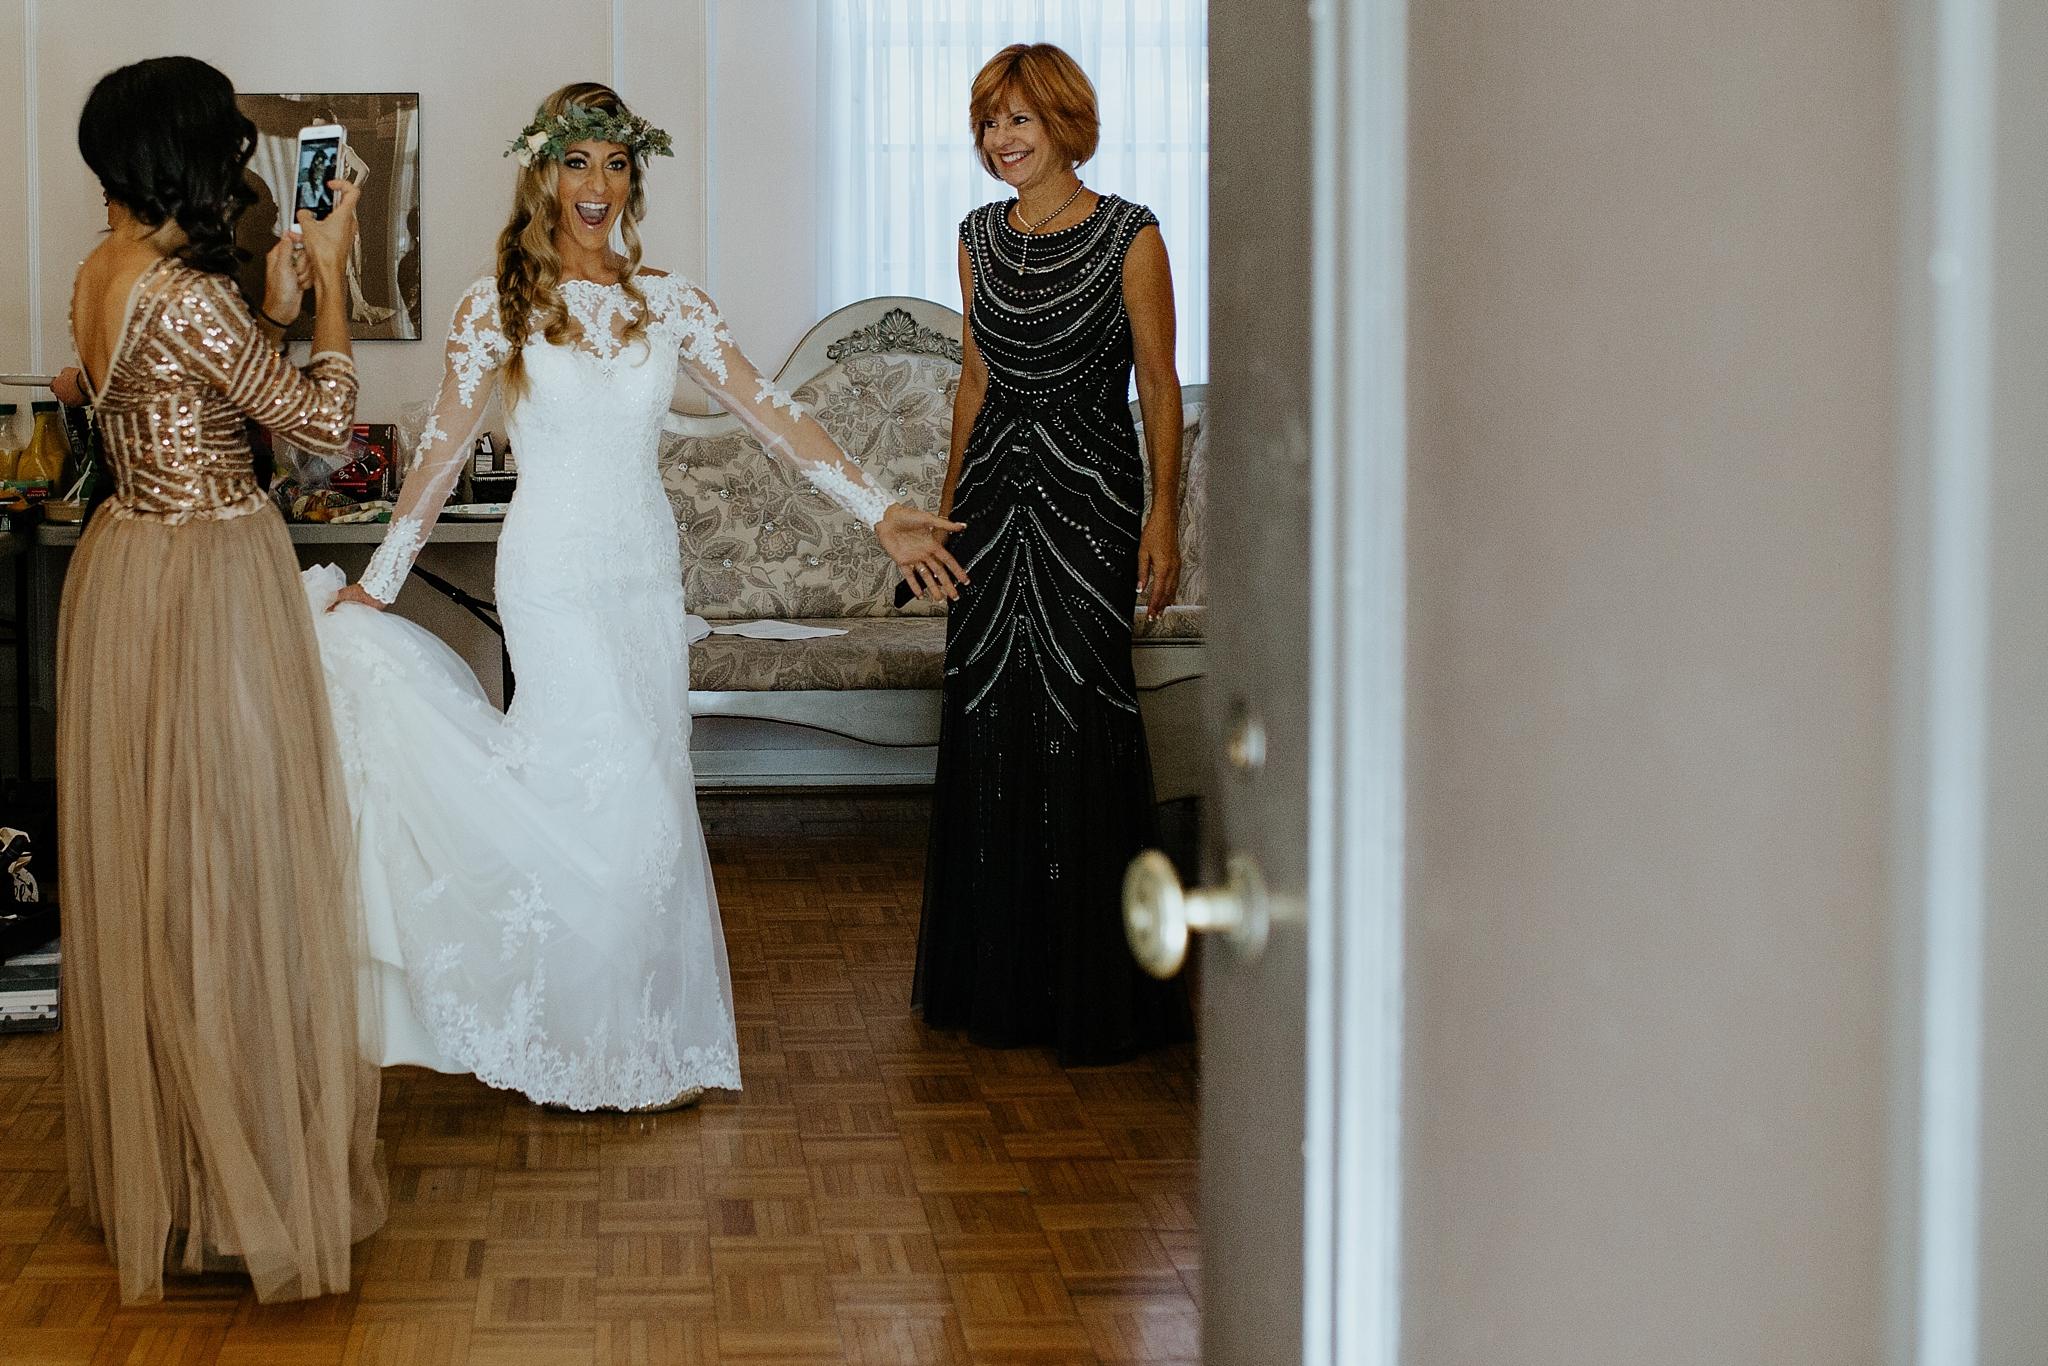 Bohemian Orcutt Ranch Wedding in Los Angeles California  - Los Angeles Californai Wedding Photographer_0008.jpg